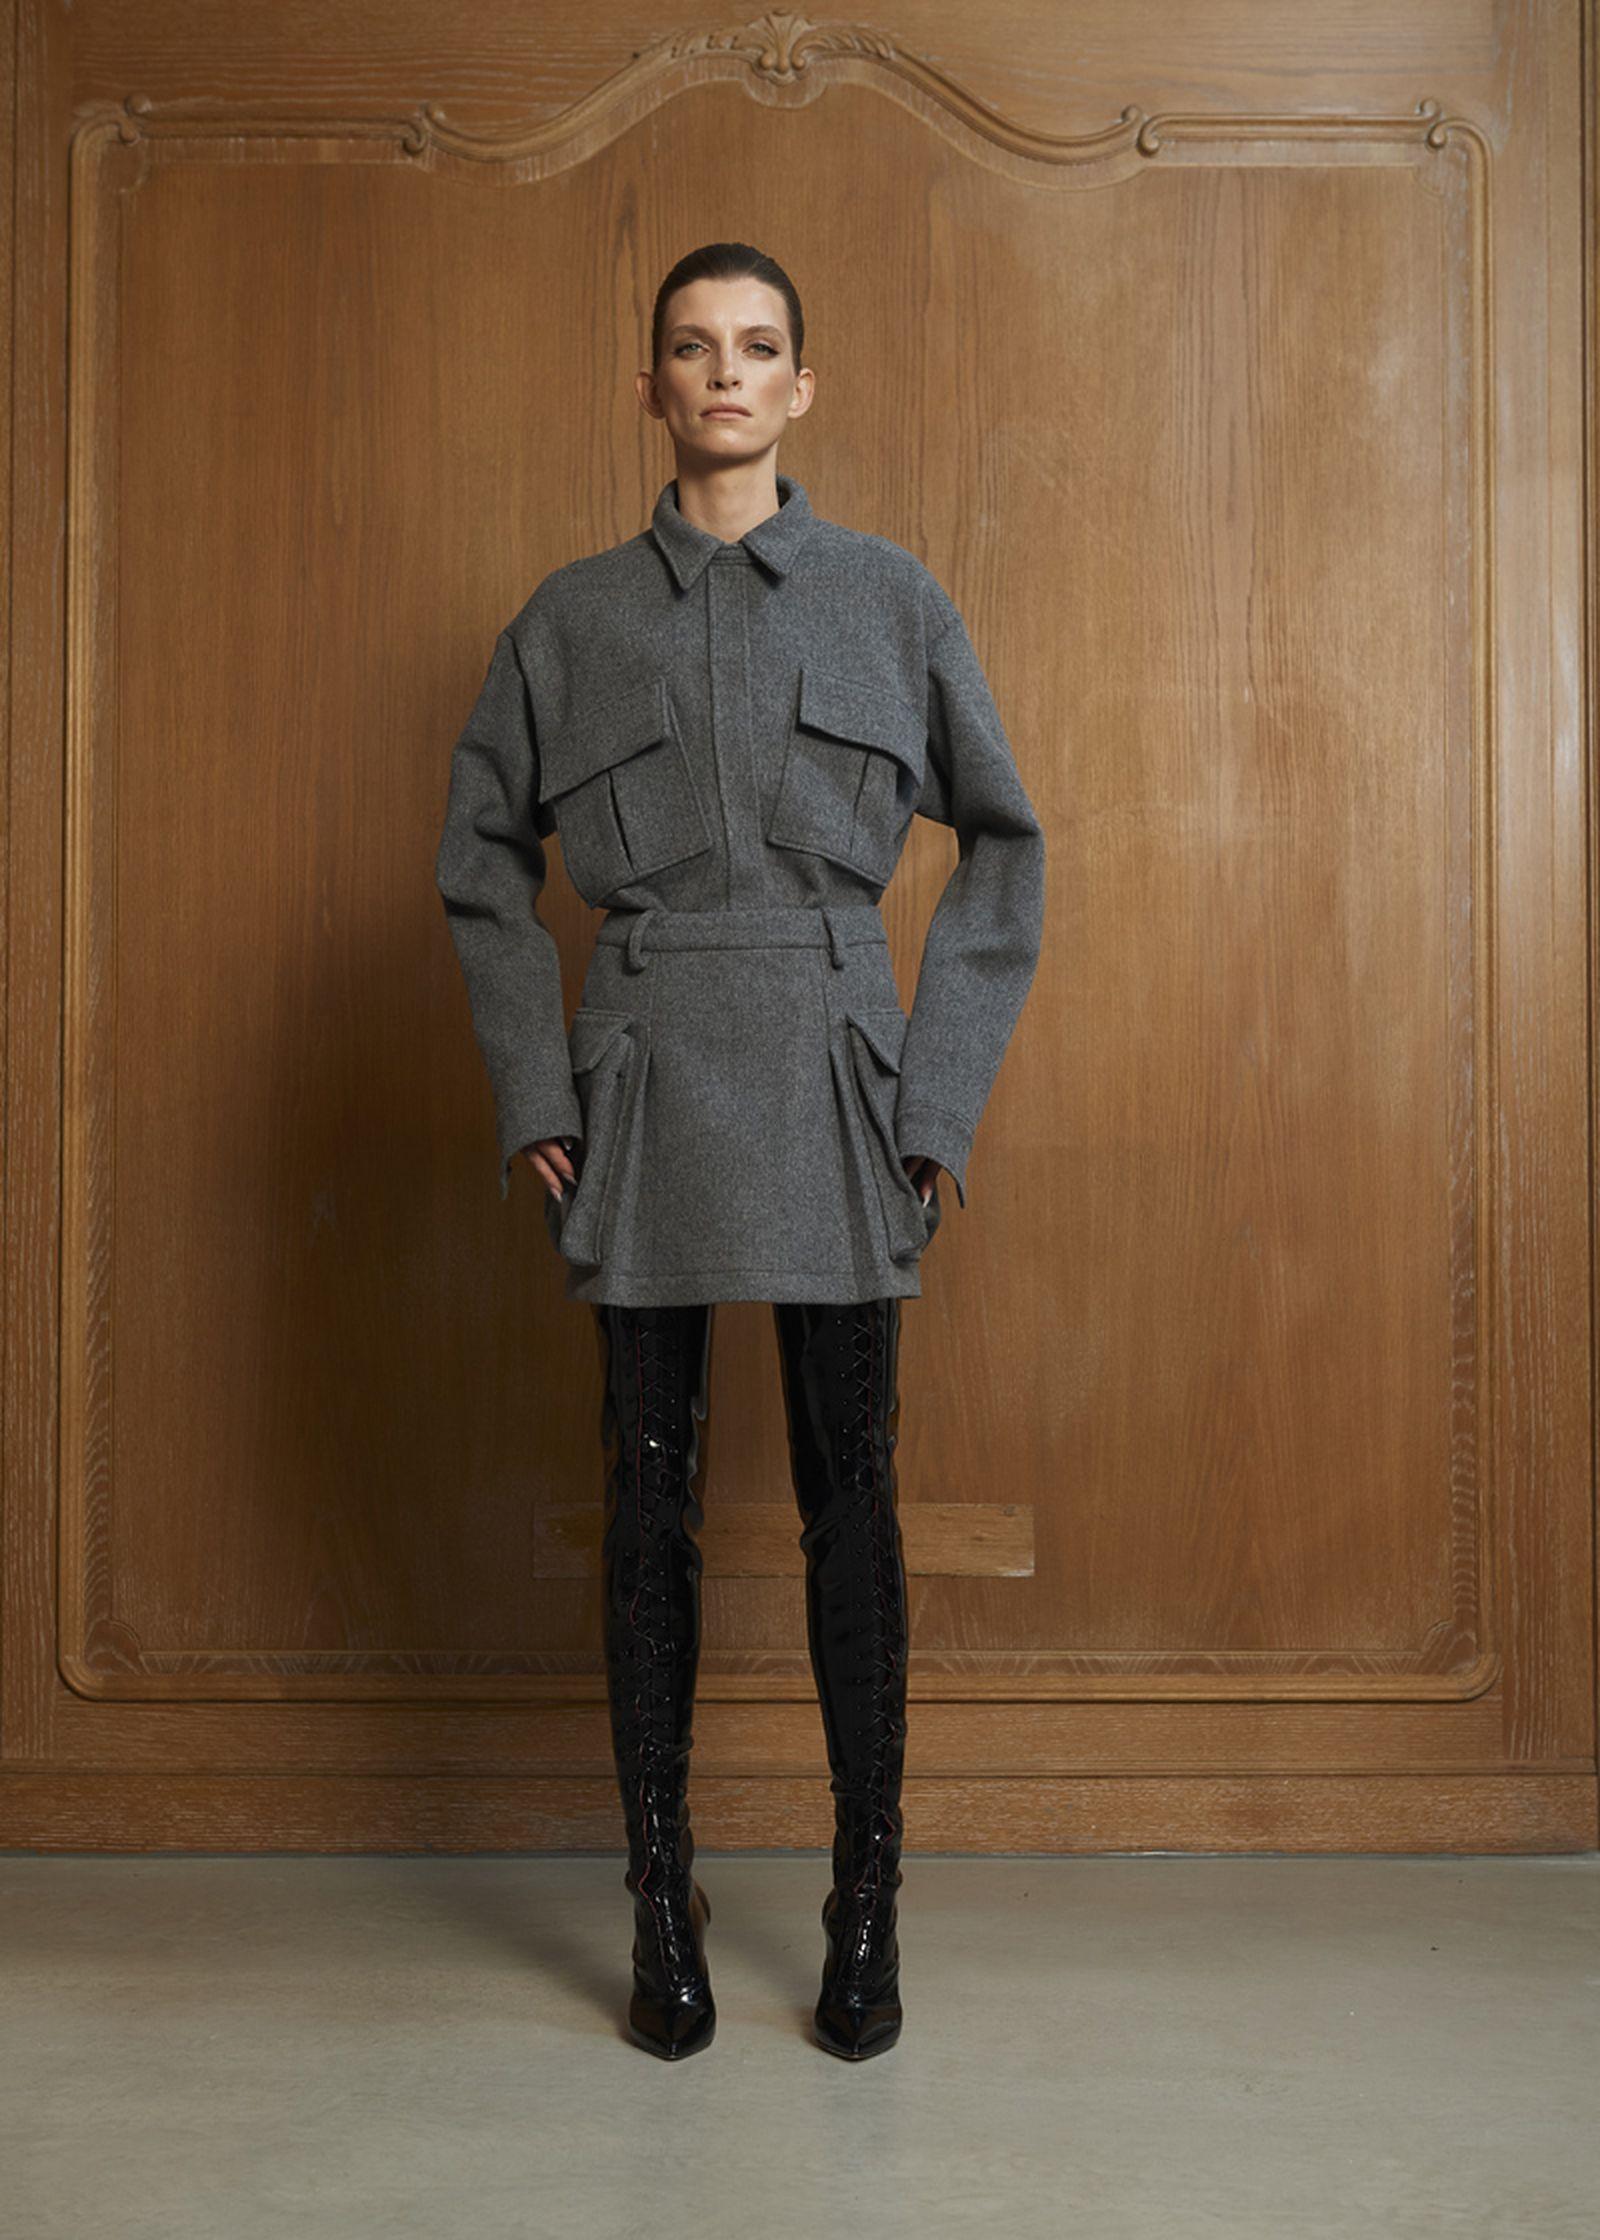 032c-rtw-womenswear-collection-paris-01